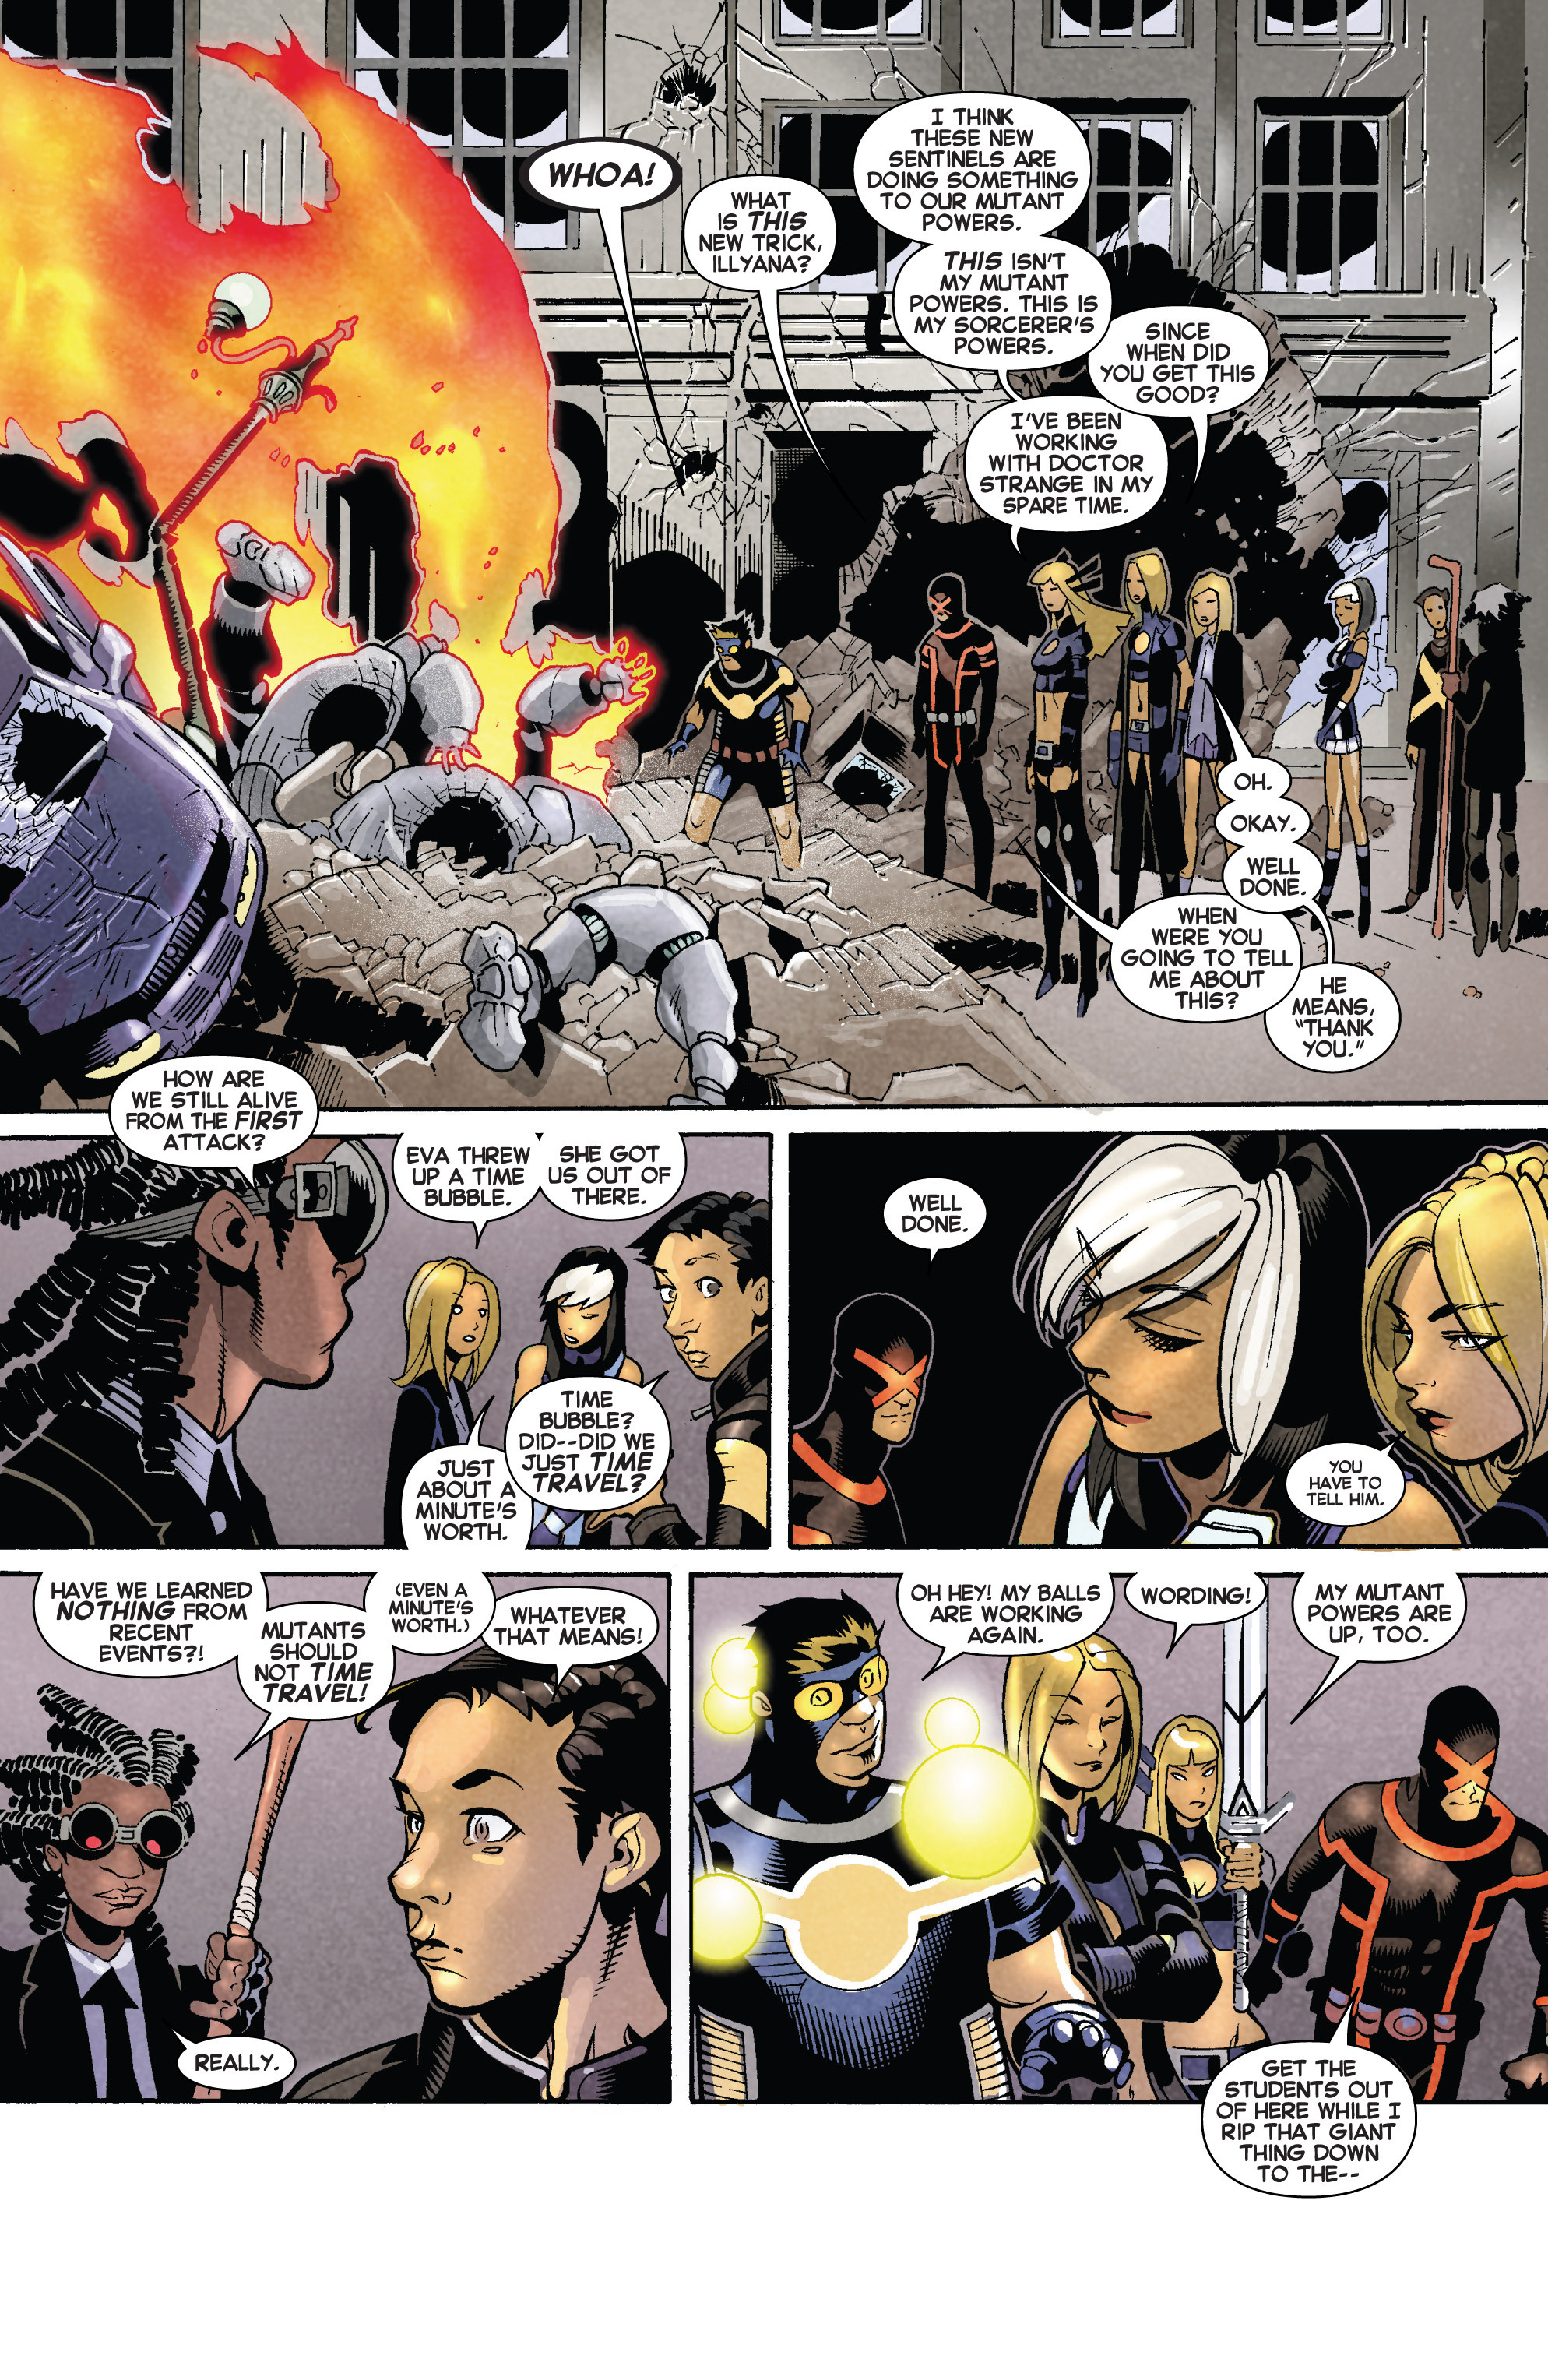 Read online Uncanny X-Men (2013) comic -  Issue # _TPB 4 - vs. S.H.I.E.L.D - 18